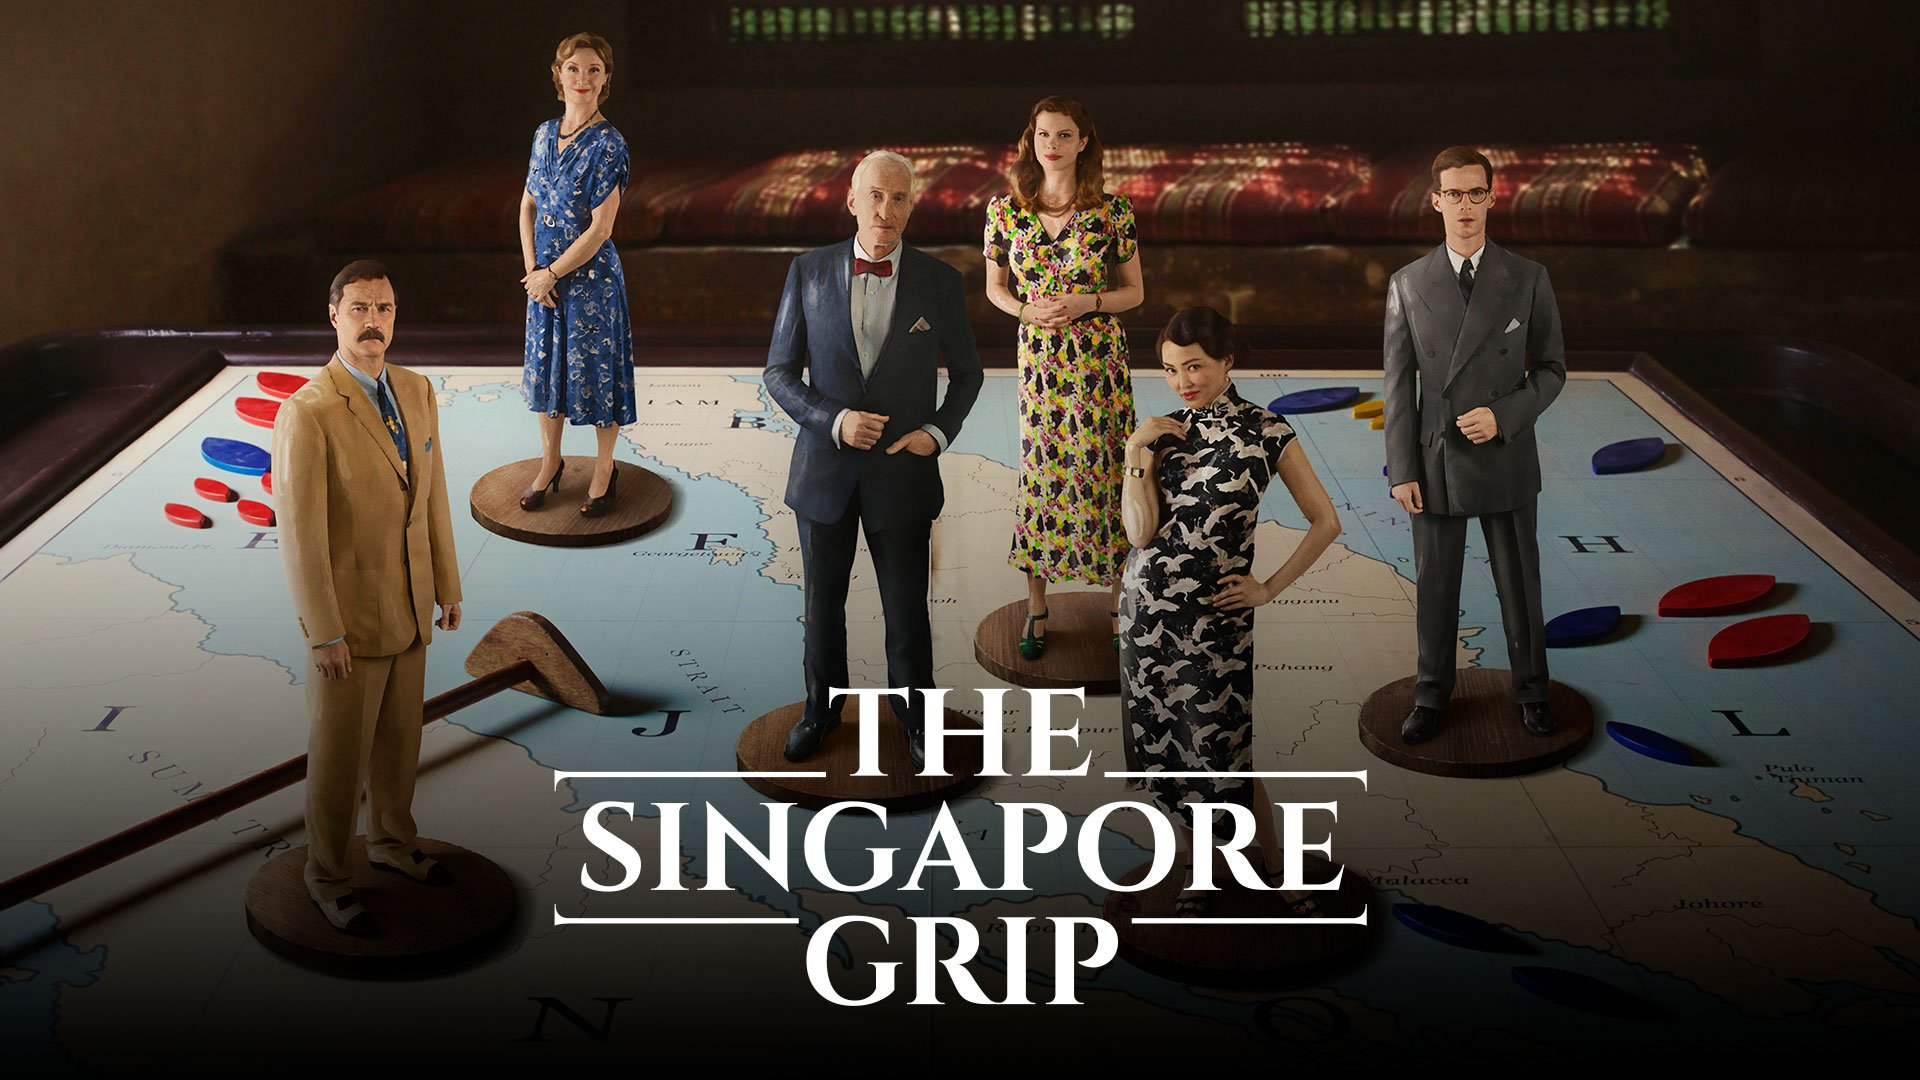 The Singapore Grip on BritBox UK